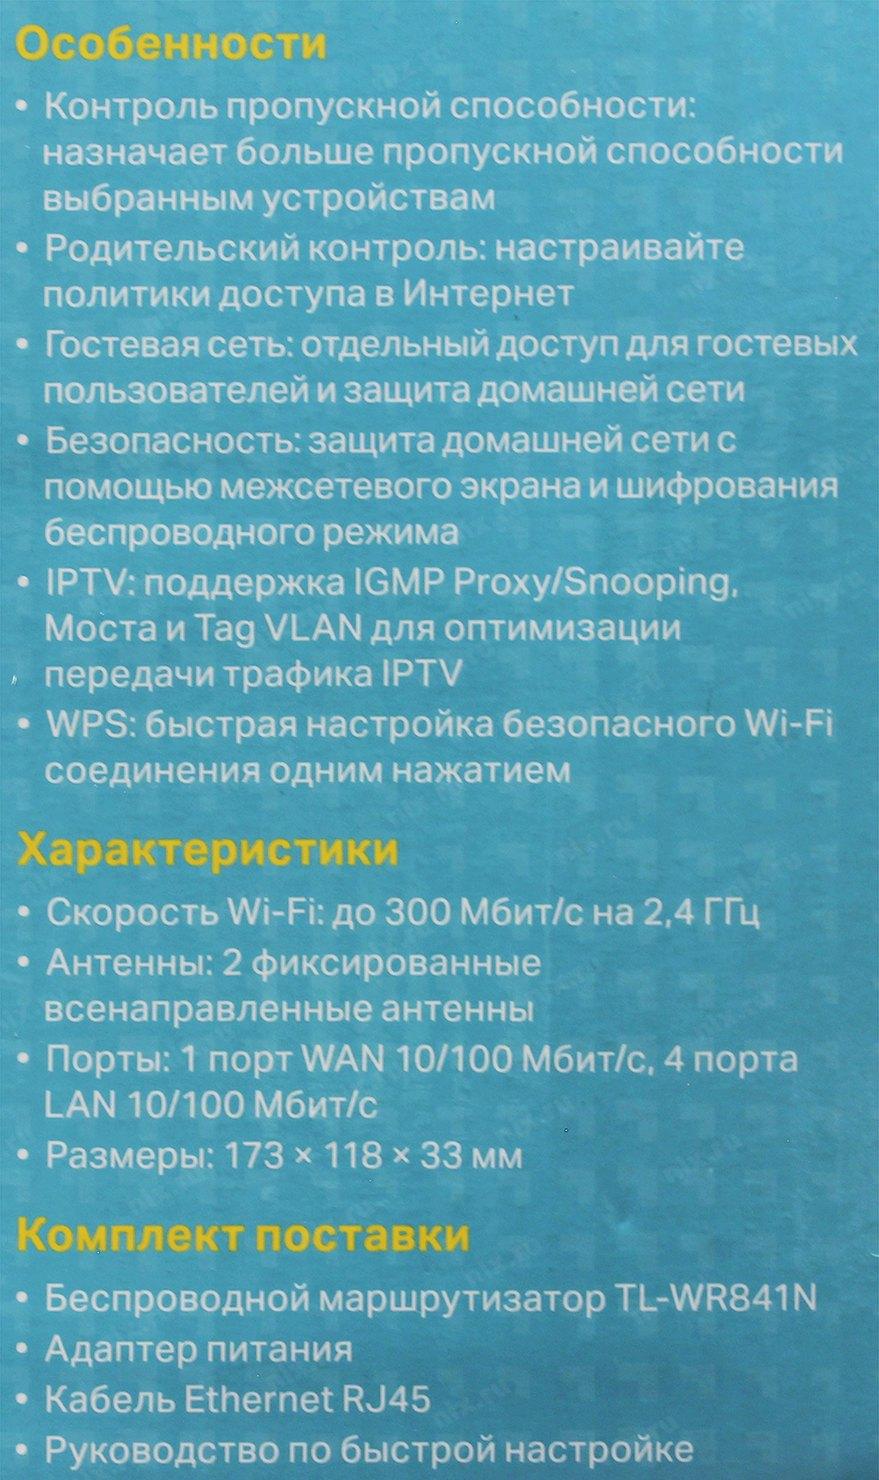 Koks Телеграм Томск Спайс онлайн Норильск